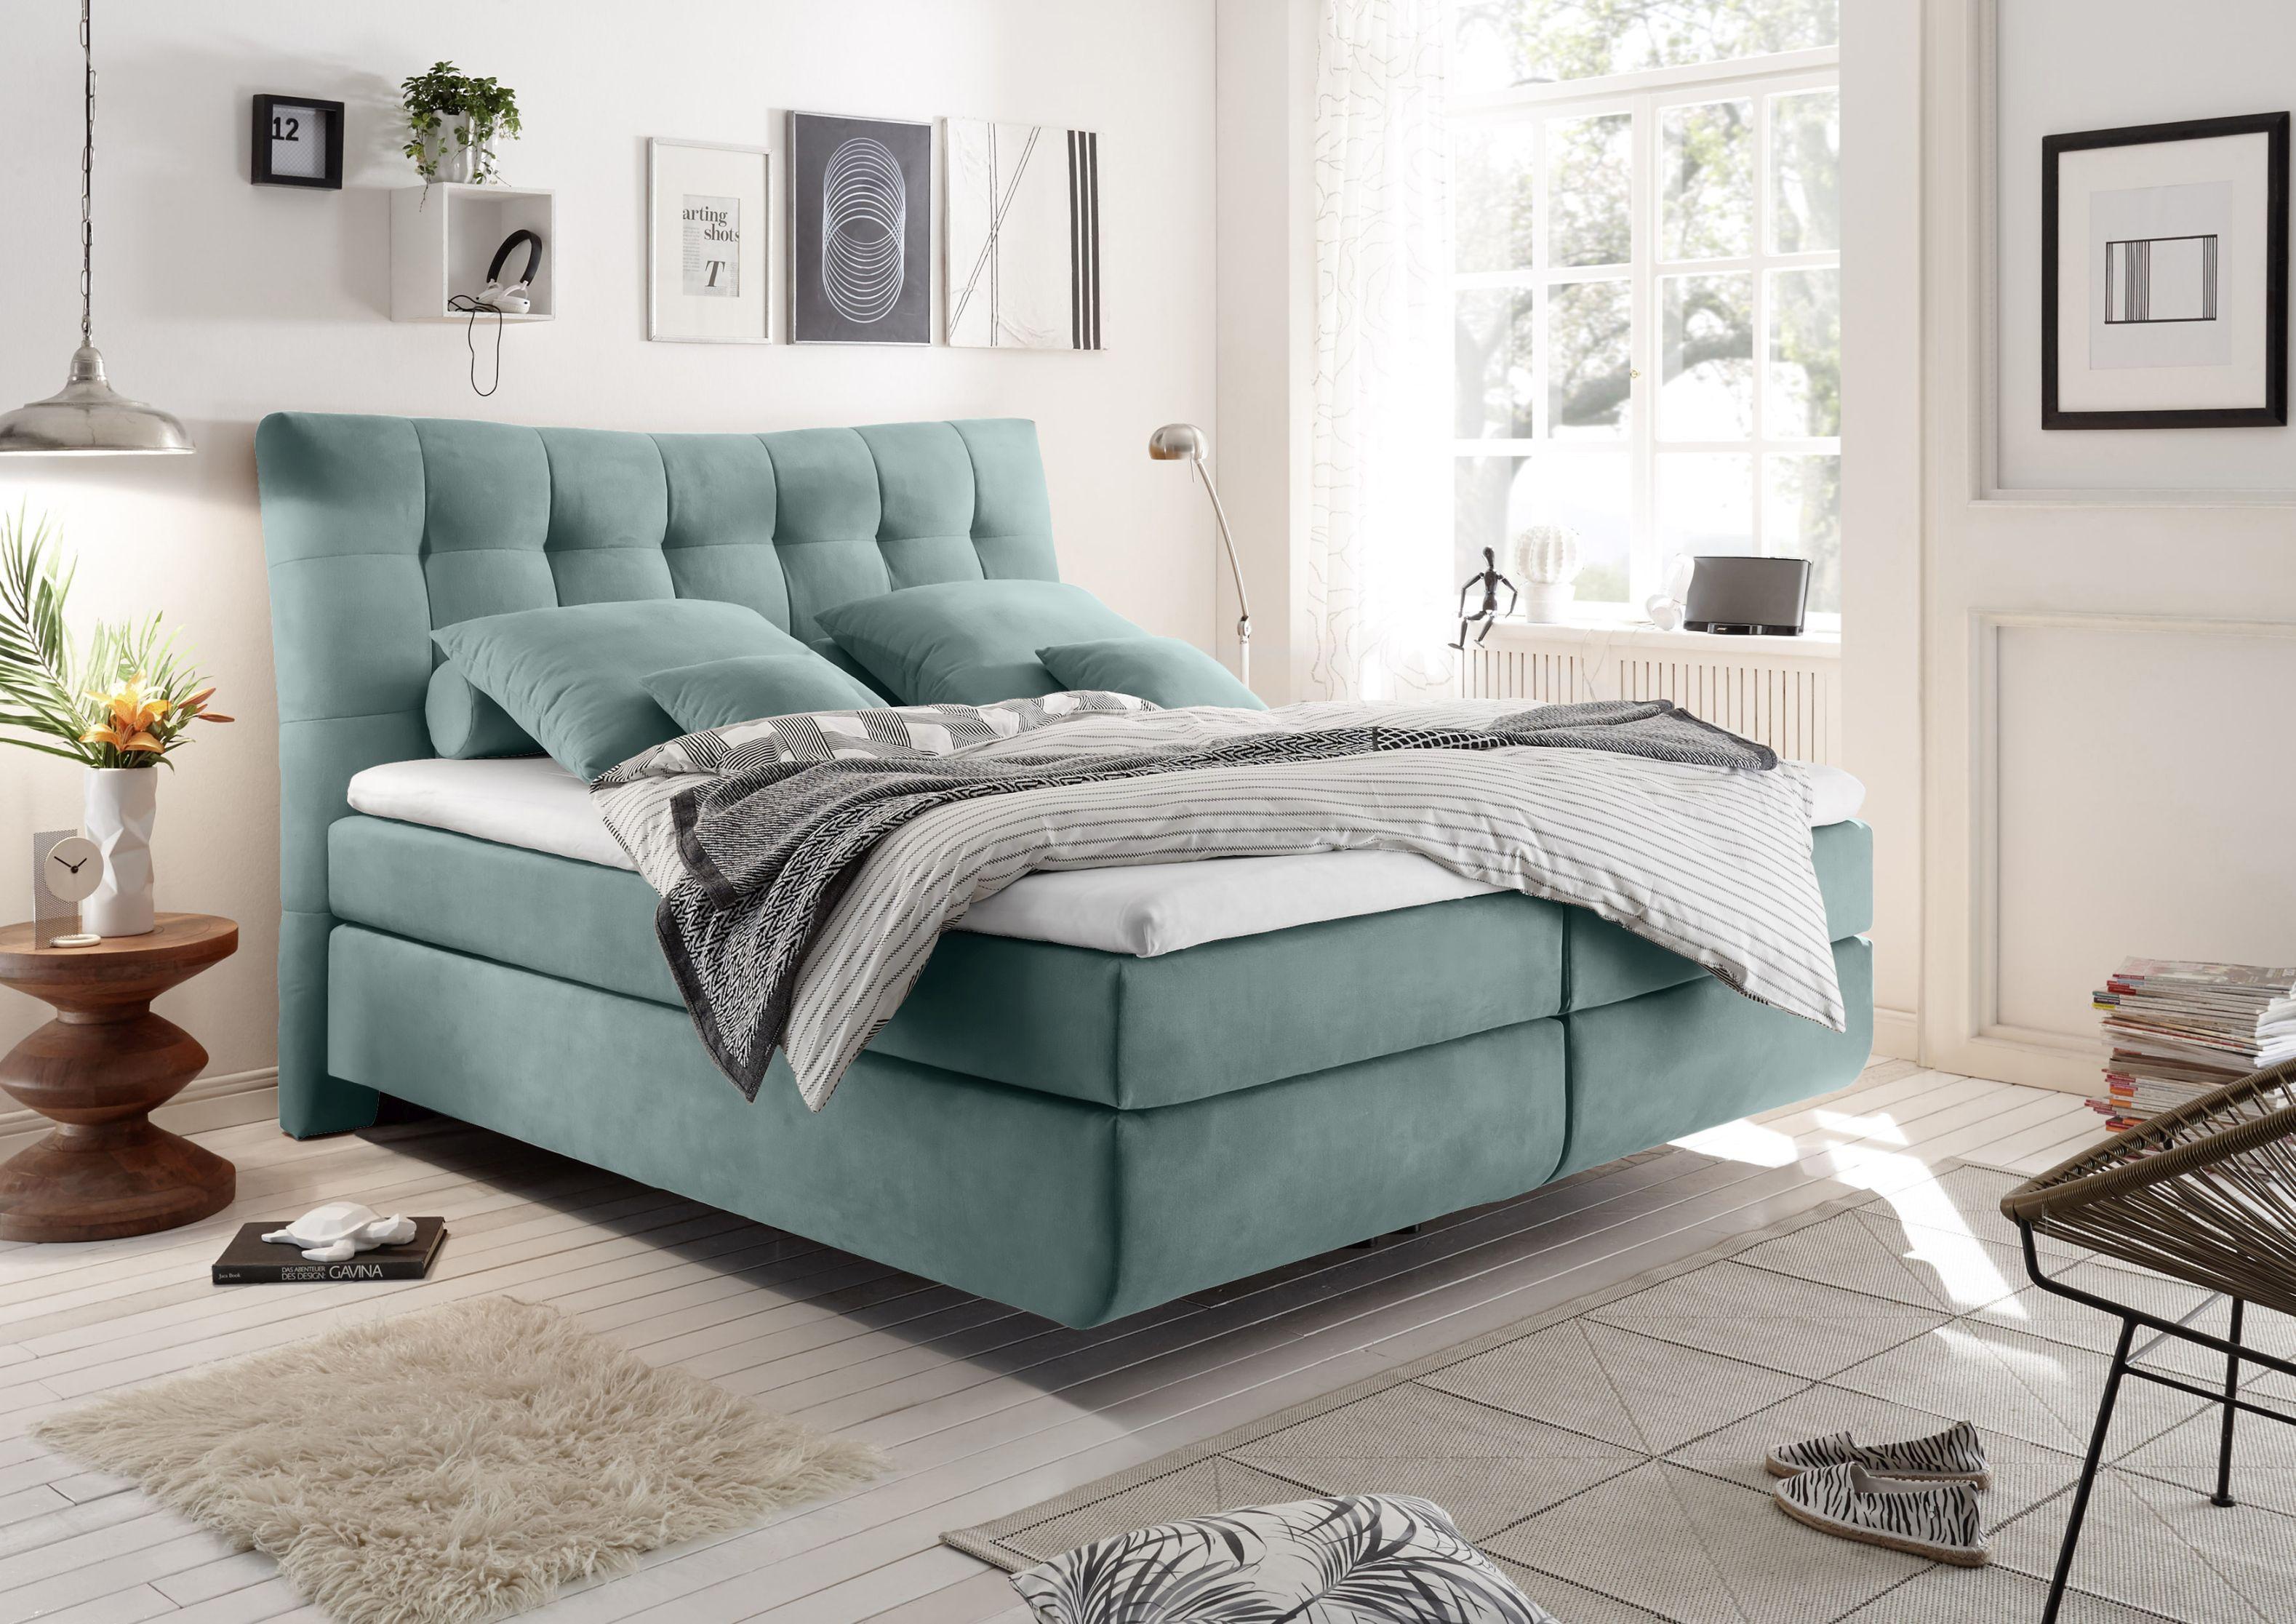 Details zu Boxspringbett 180cm blau Funktionspolsterbett Polsterbett  Schlafzimmer Bett MB2